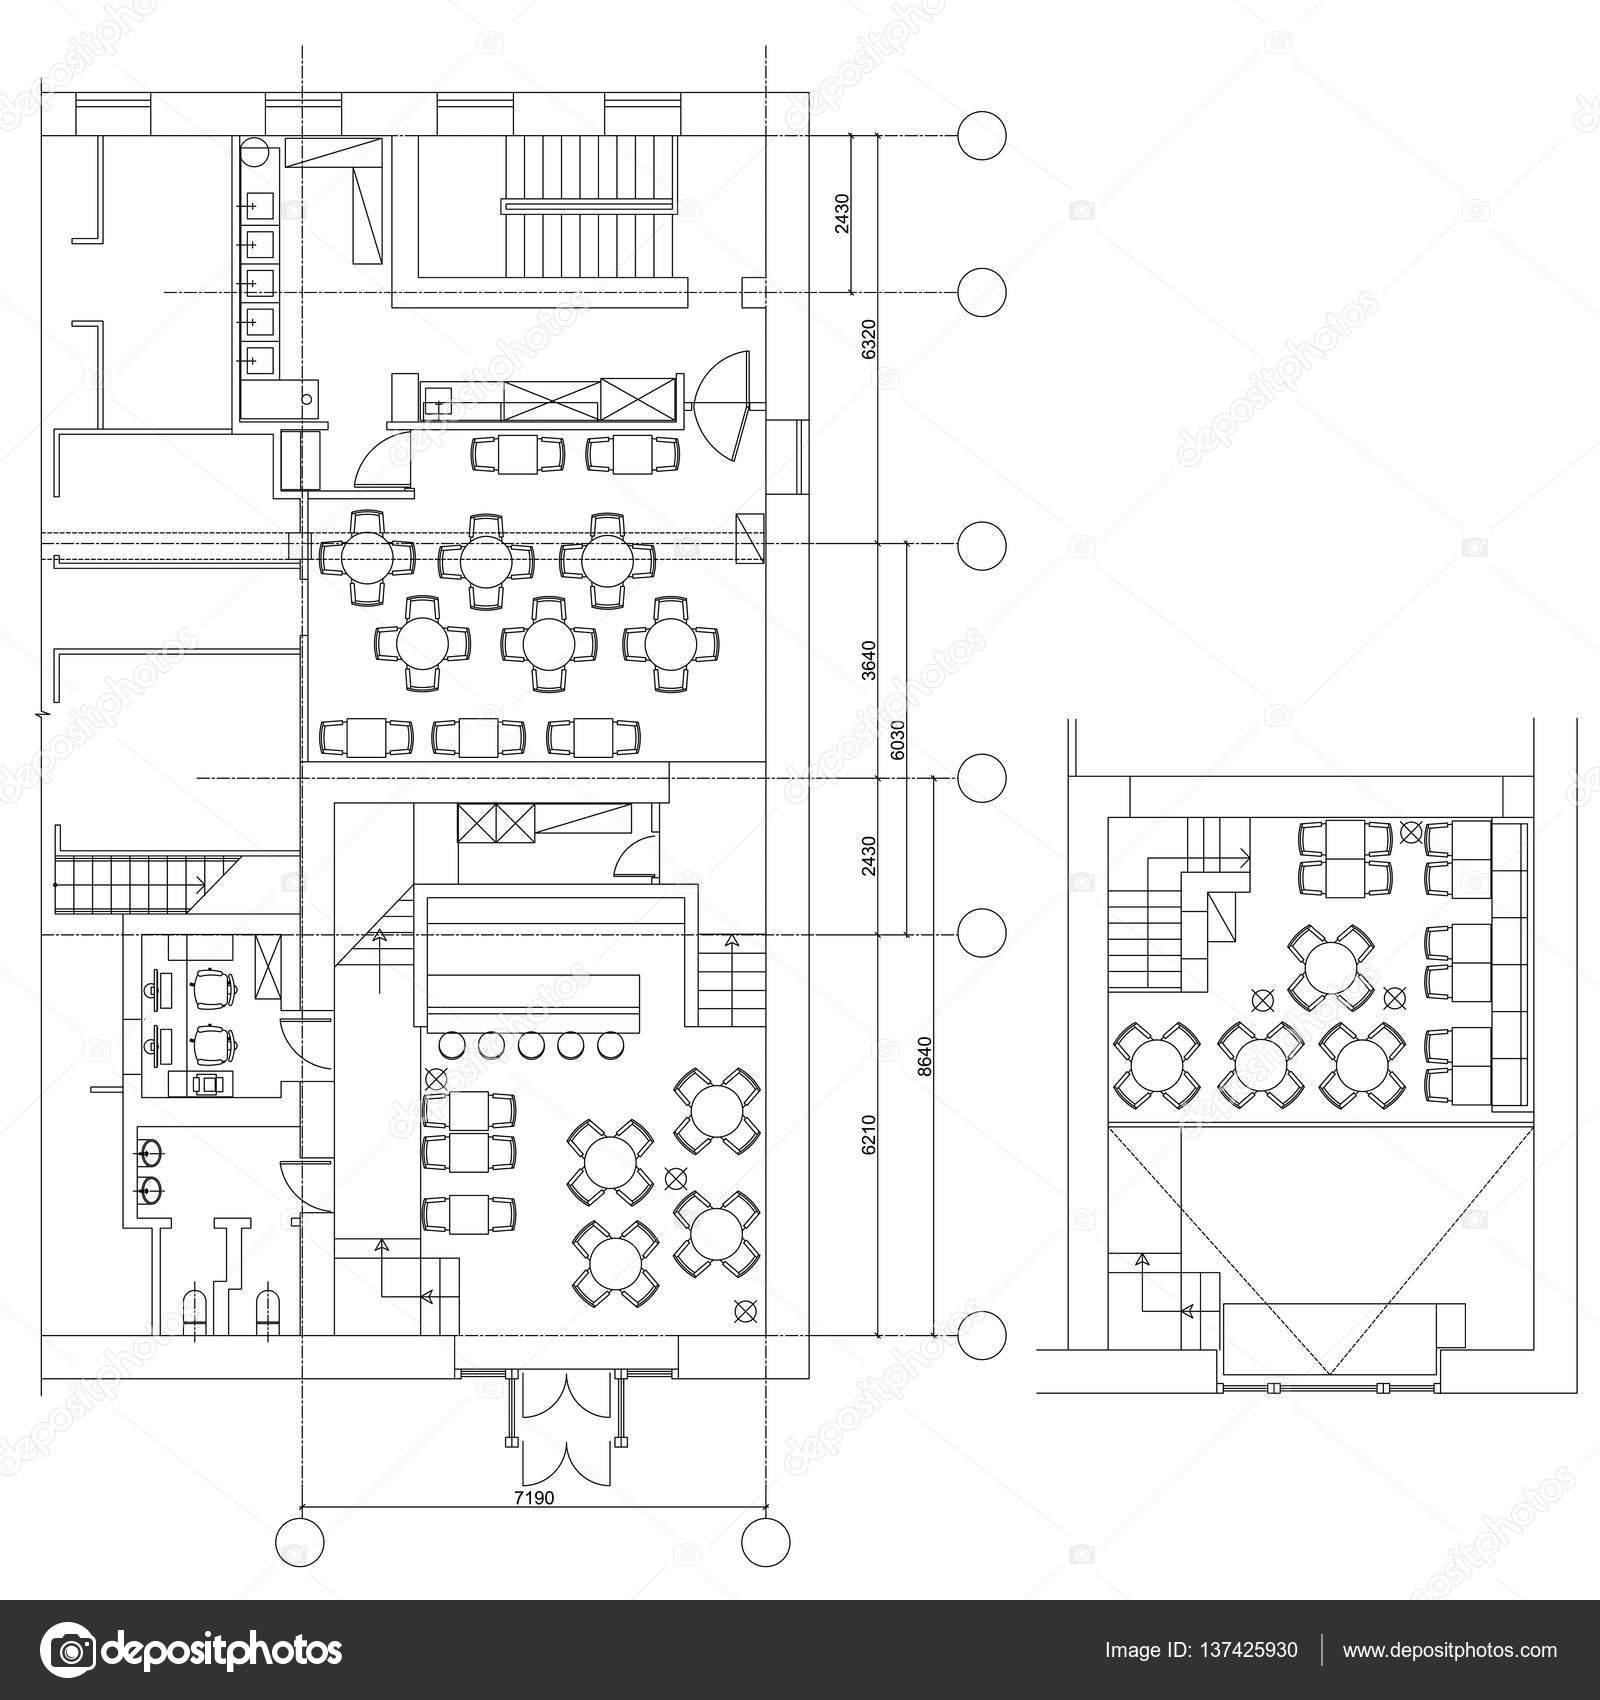 Standard-Café Möbel Symbole auf Grundrisse — Stockvektor © YAZZIK ...